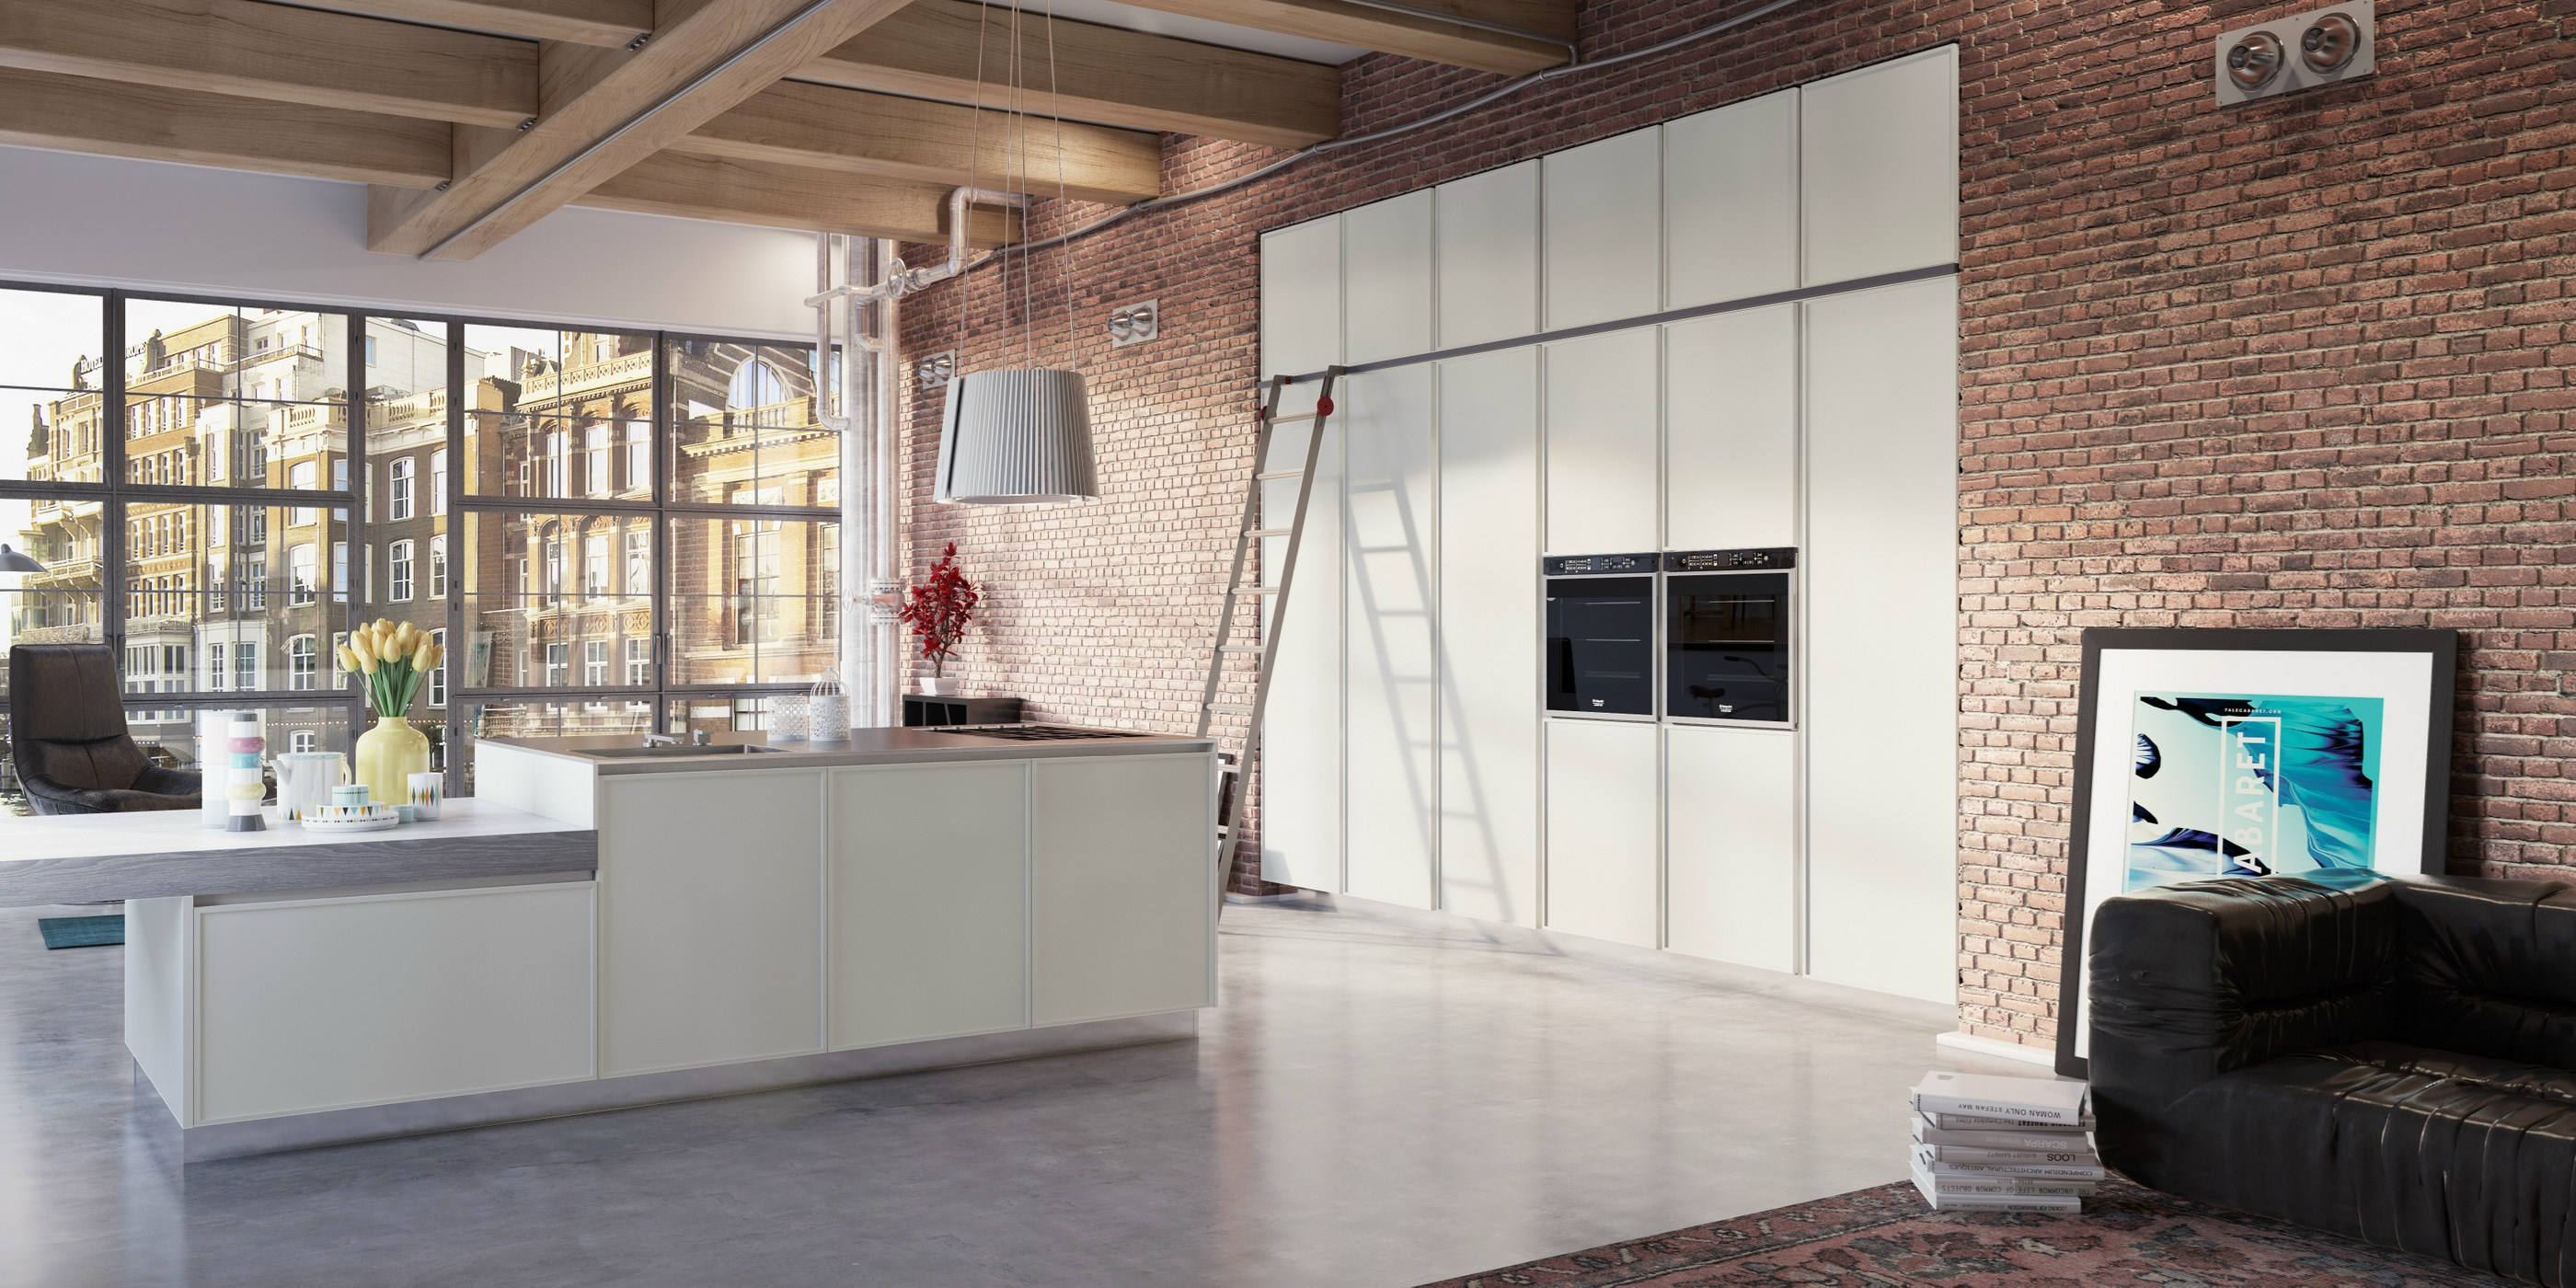 Cucine neoclassiche : cucine neoclassiche quizlet. cucine ...